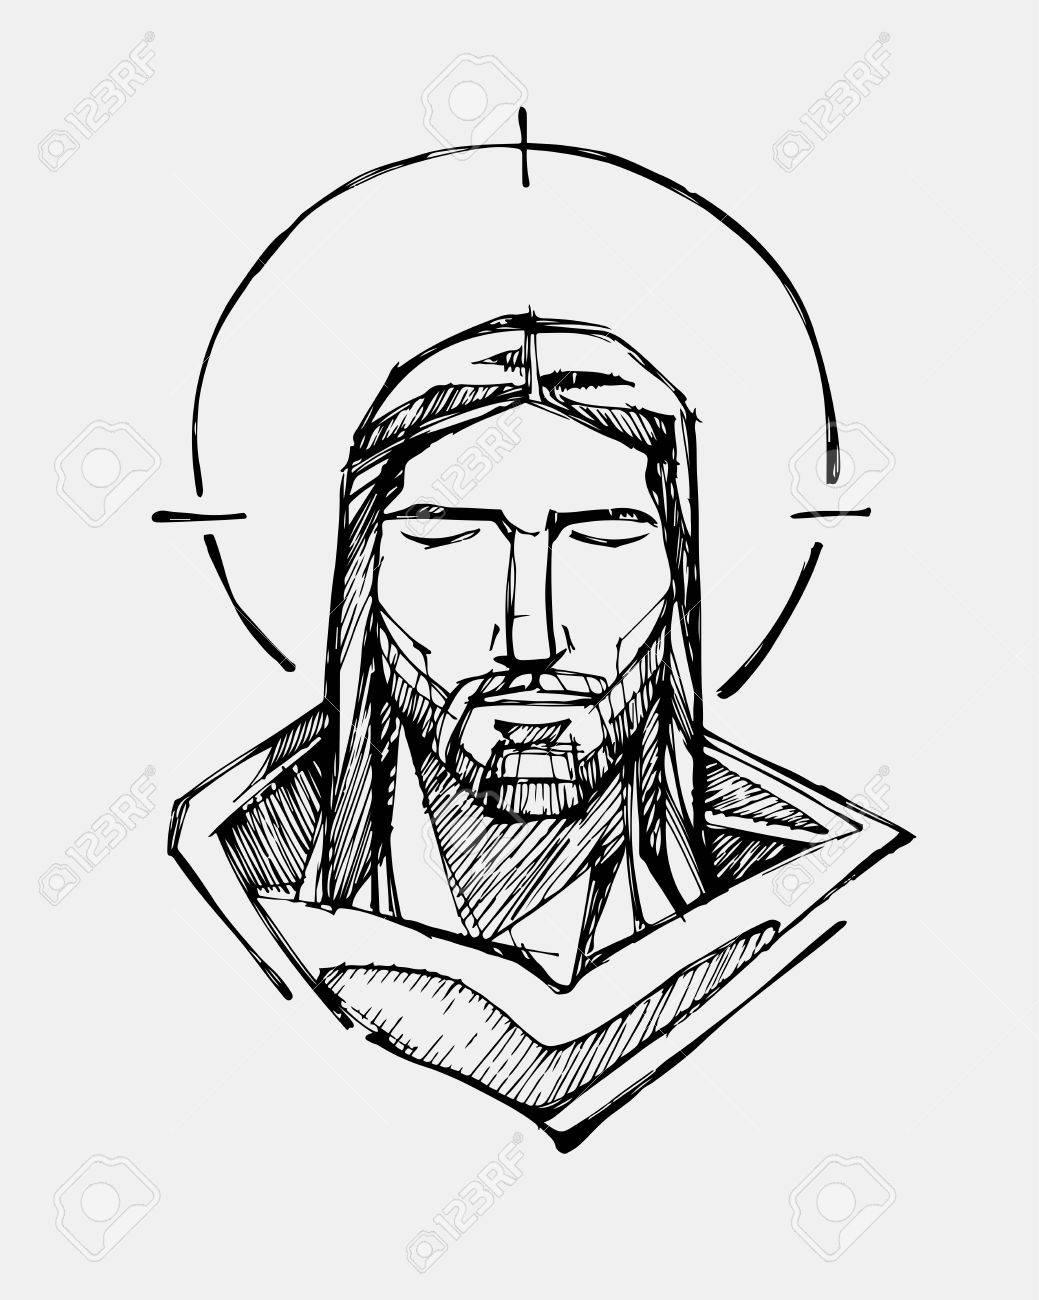 1039x1300 Hand Drawn Vector Illustration Or Drawing Of Jesus Christ Serene